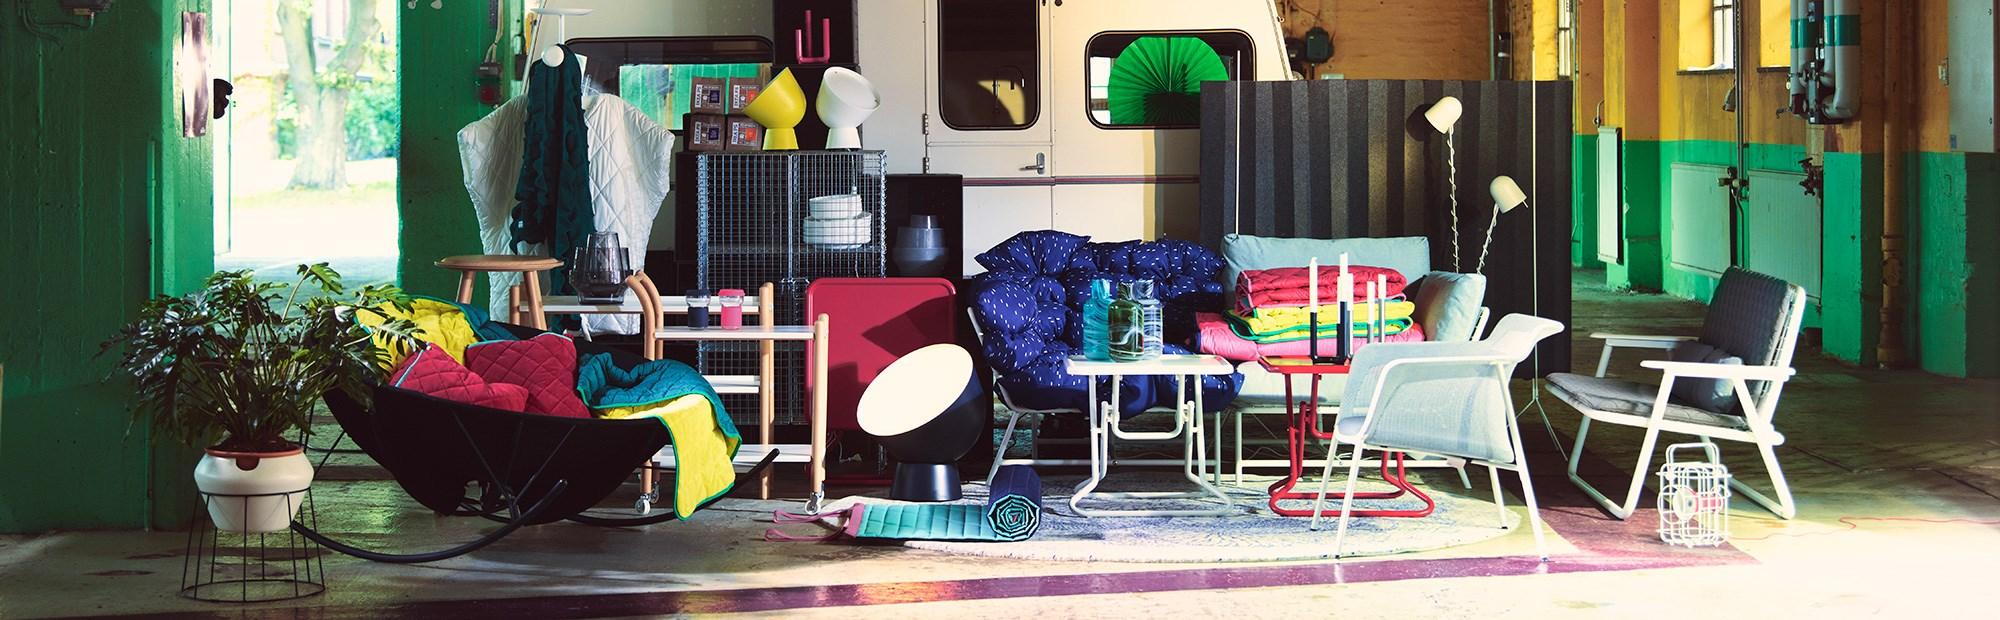 IKEA lanceert een nieuwe IKEA PS collectie - Lifestylelady.nl